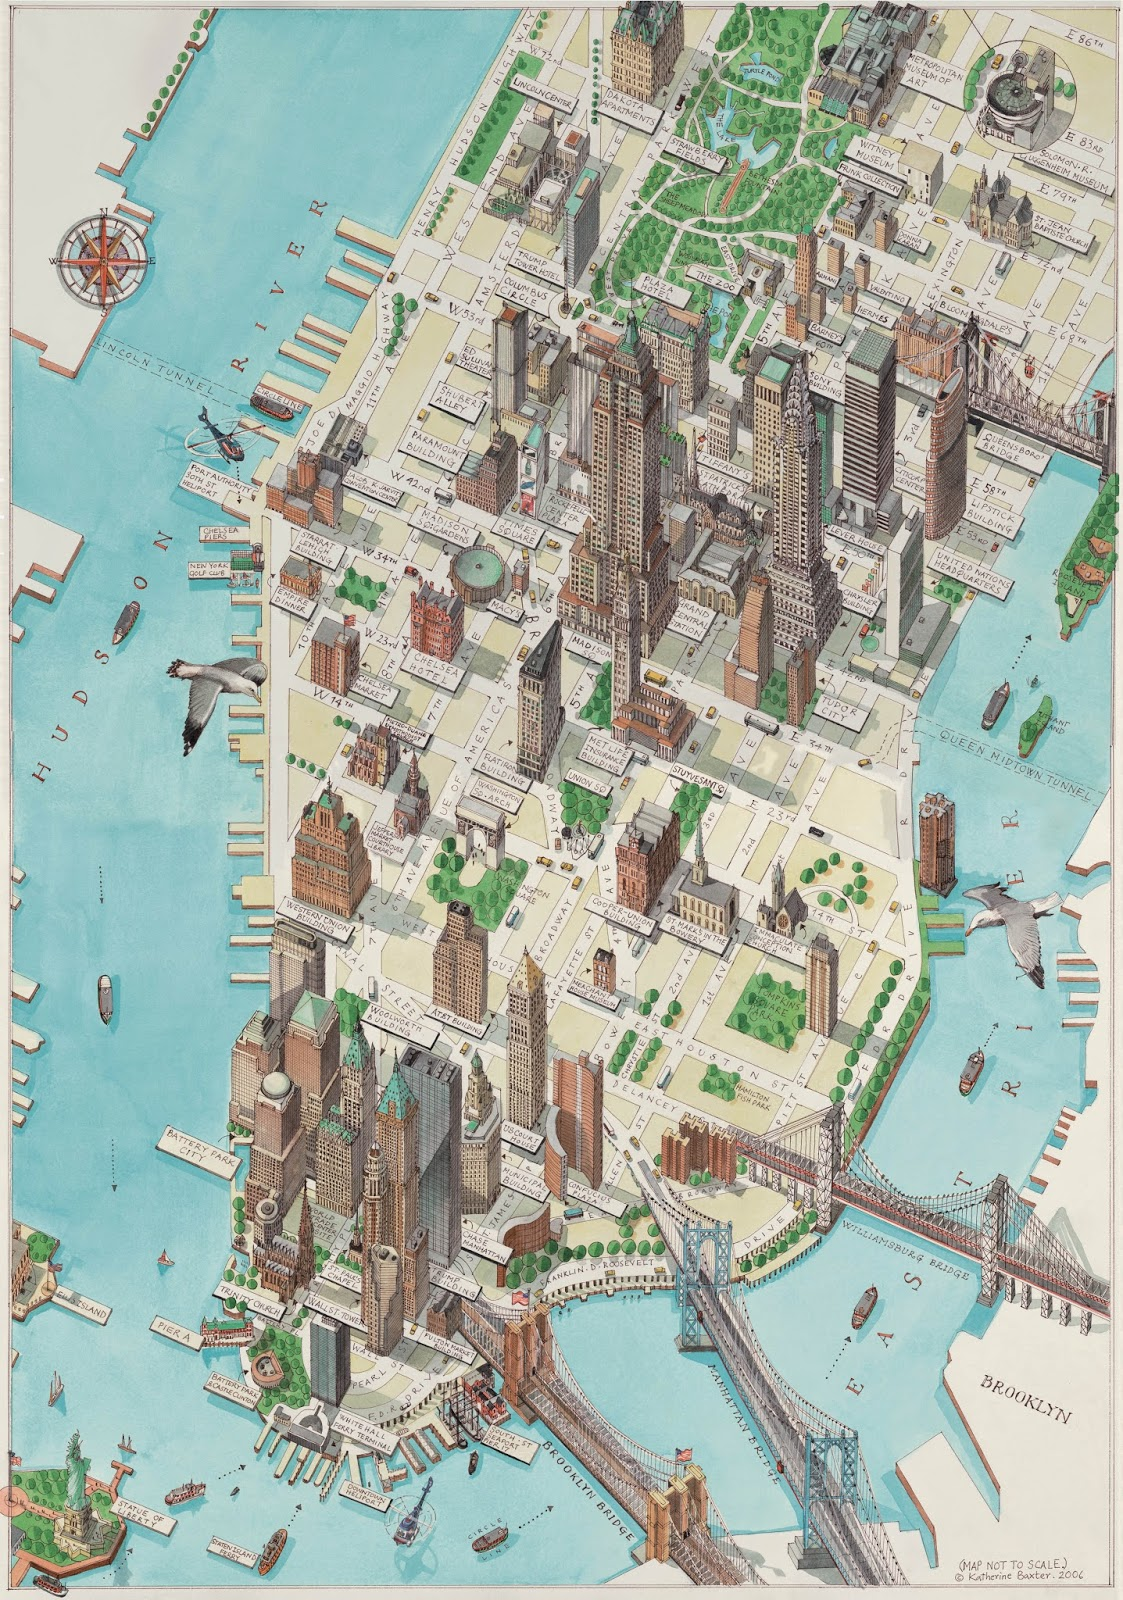 download manhattan map of new york here (pdf) · download new york citysubway map (pdf). droll danes